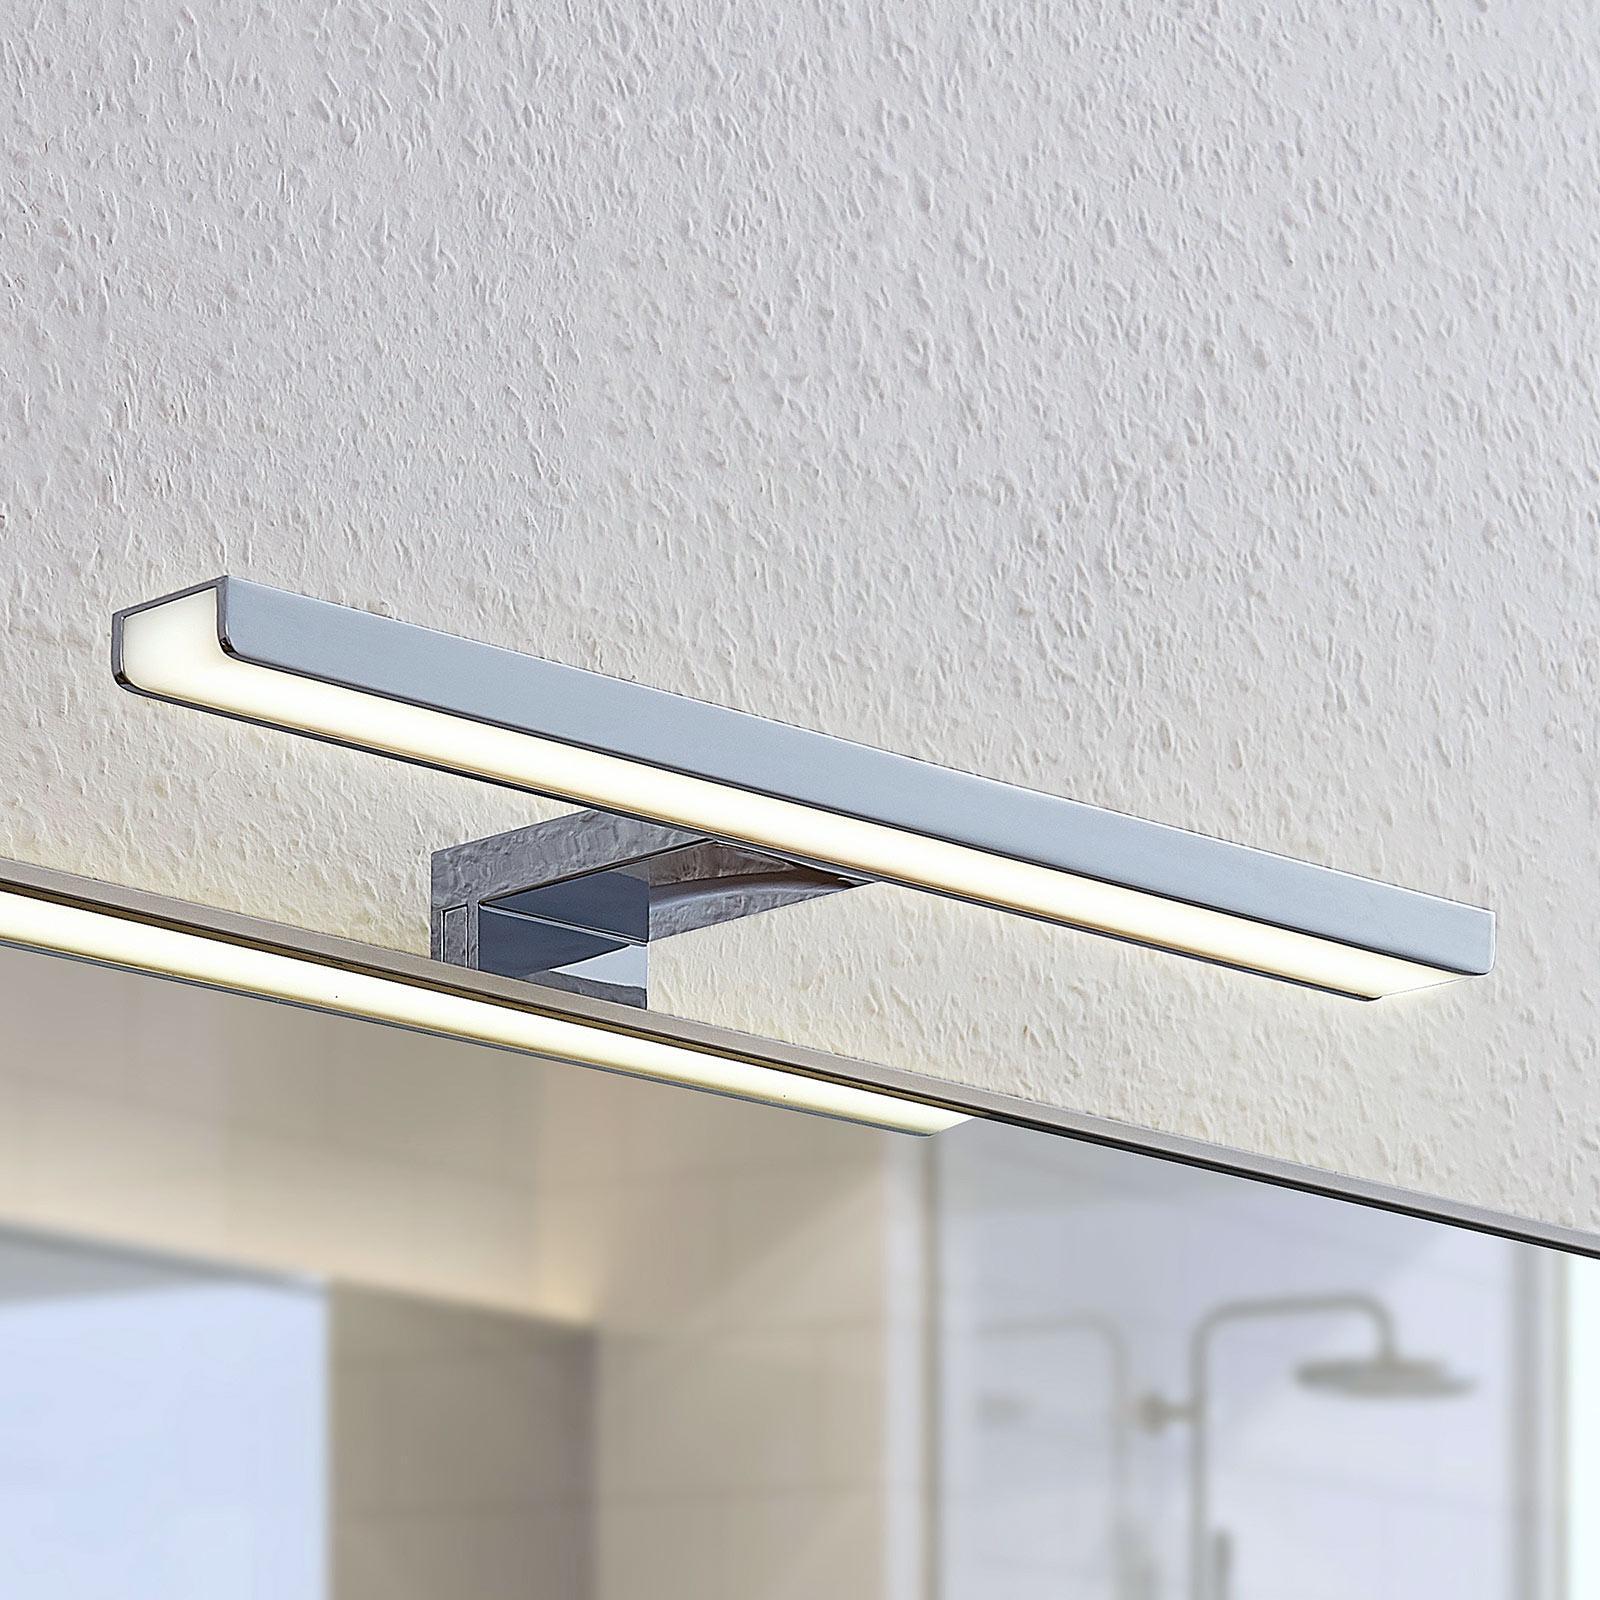 Kylpyhuoneen LED-peililamppu Peggy, 30cm